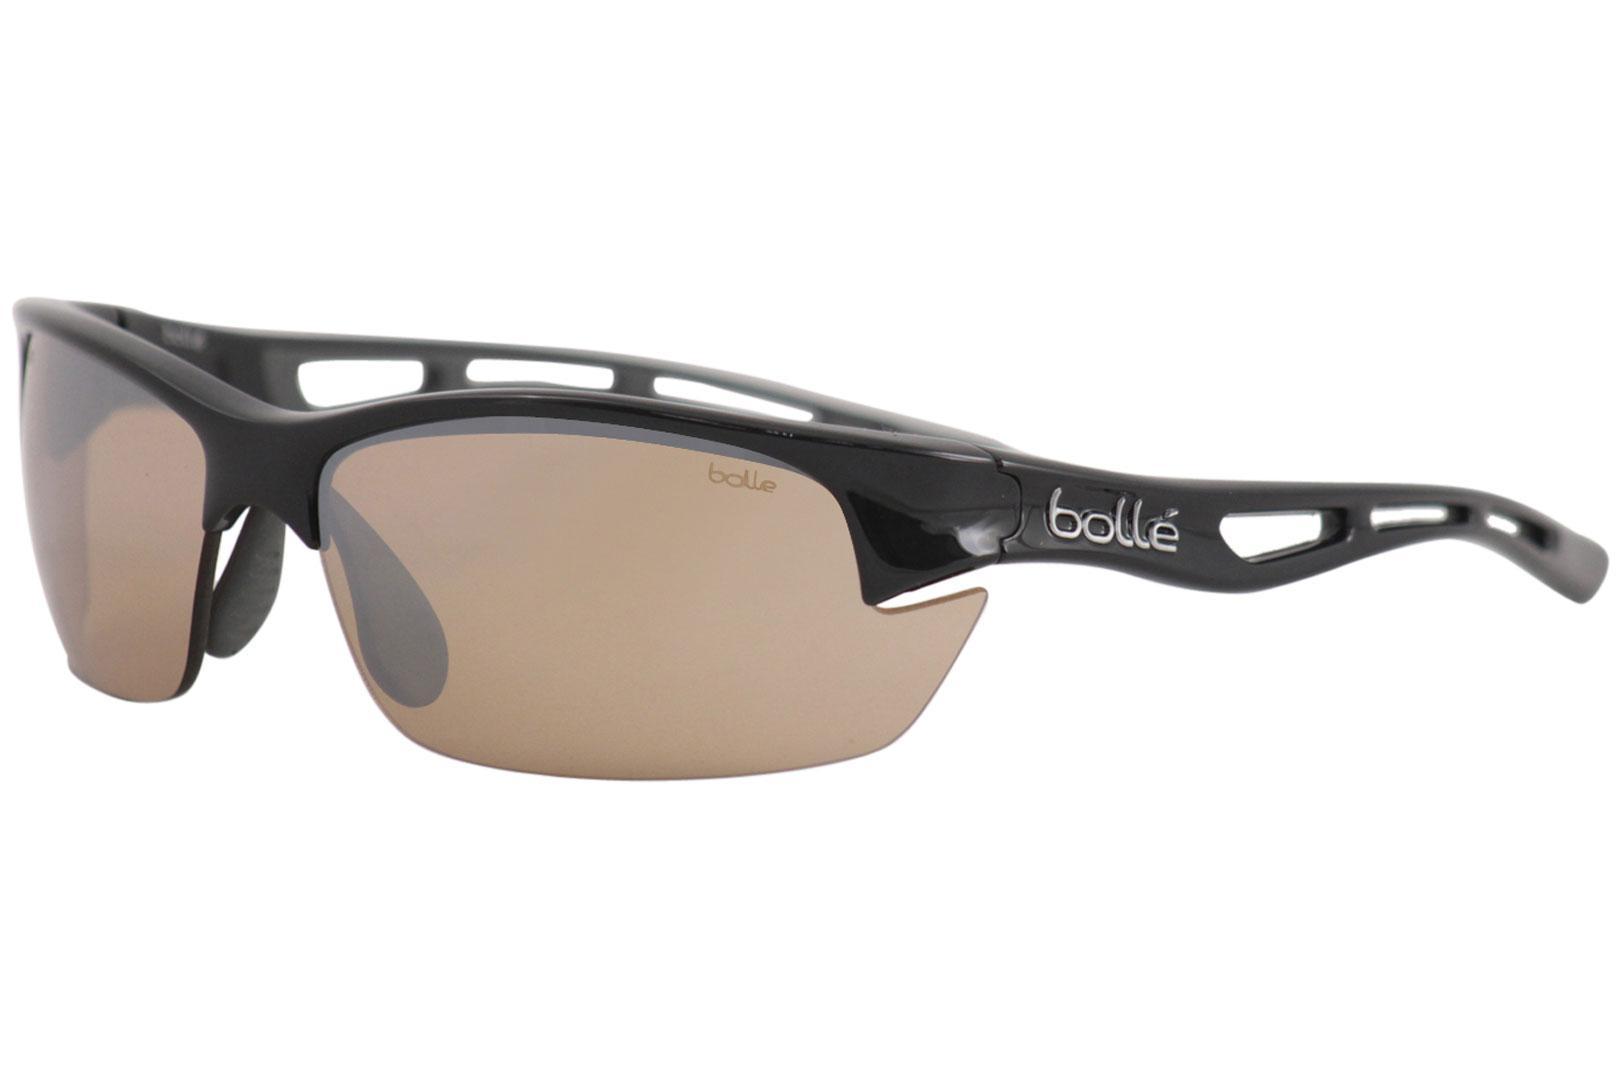 f8f33ba323 Bolle Men's Bolt-S 11781 Shiny Black Sport Rectangle Sunglasses 53mm ...